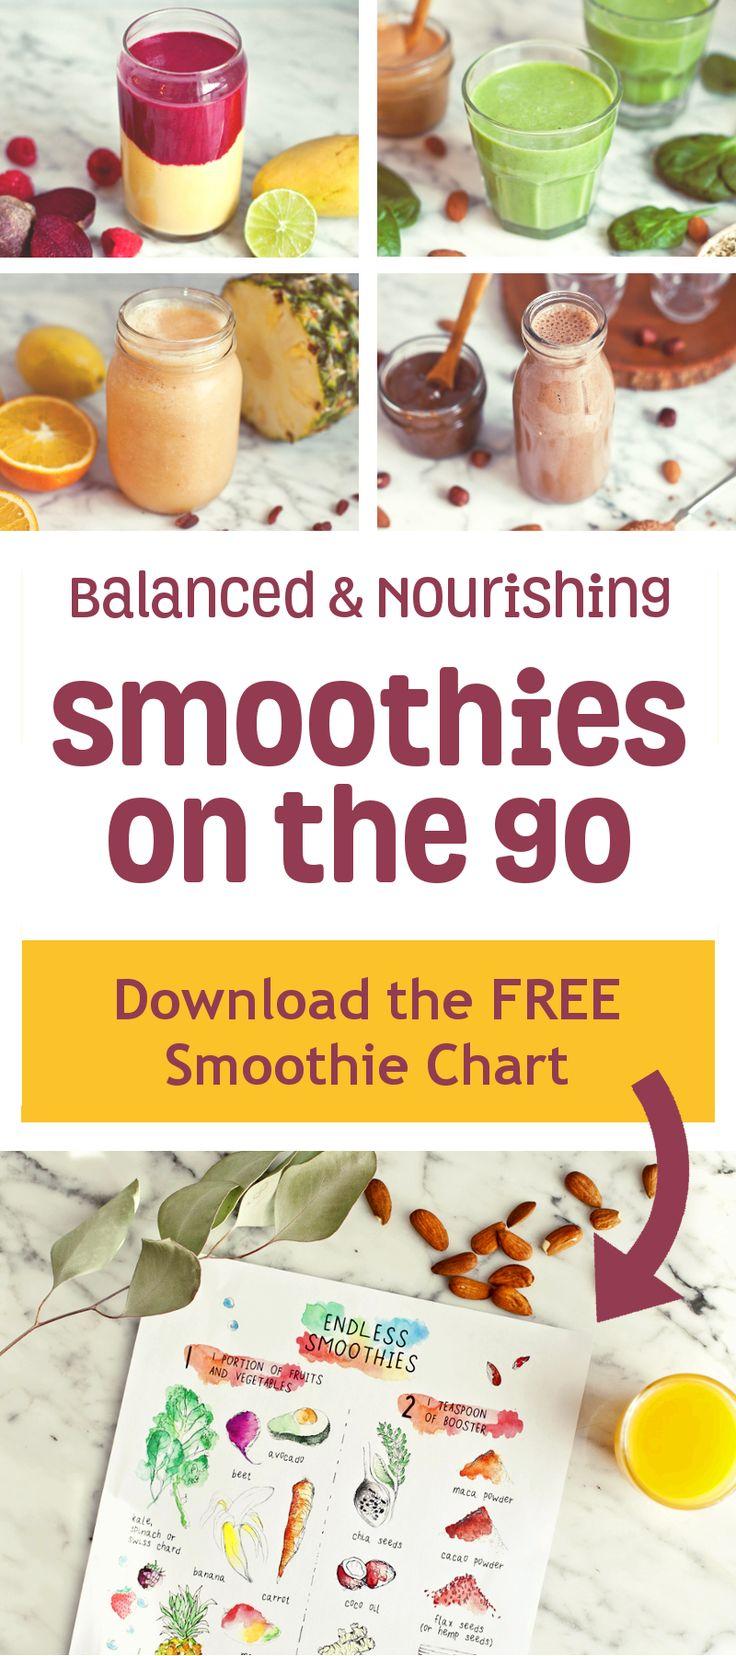 FREE Smoothie Recipe Printable Chart Download!